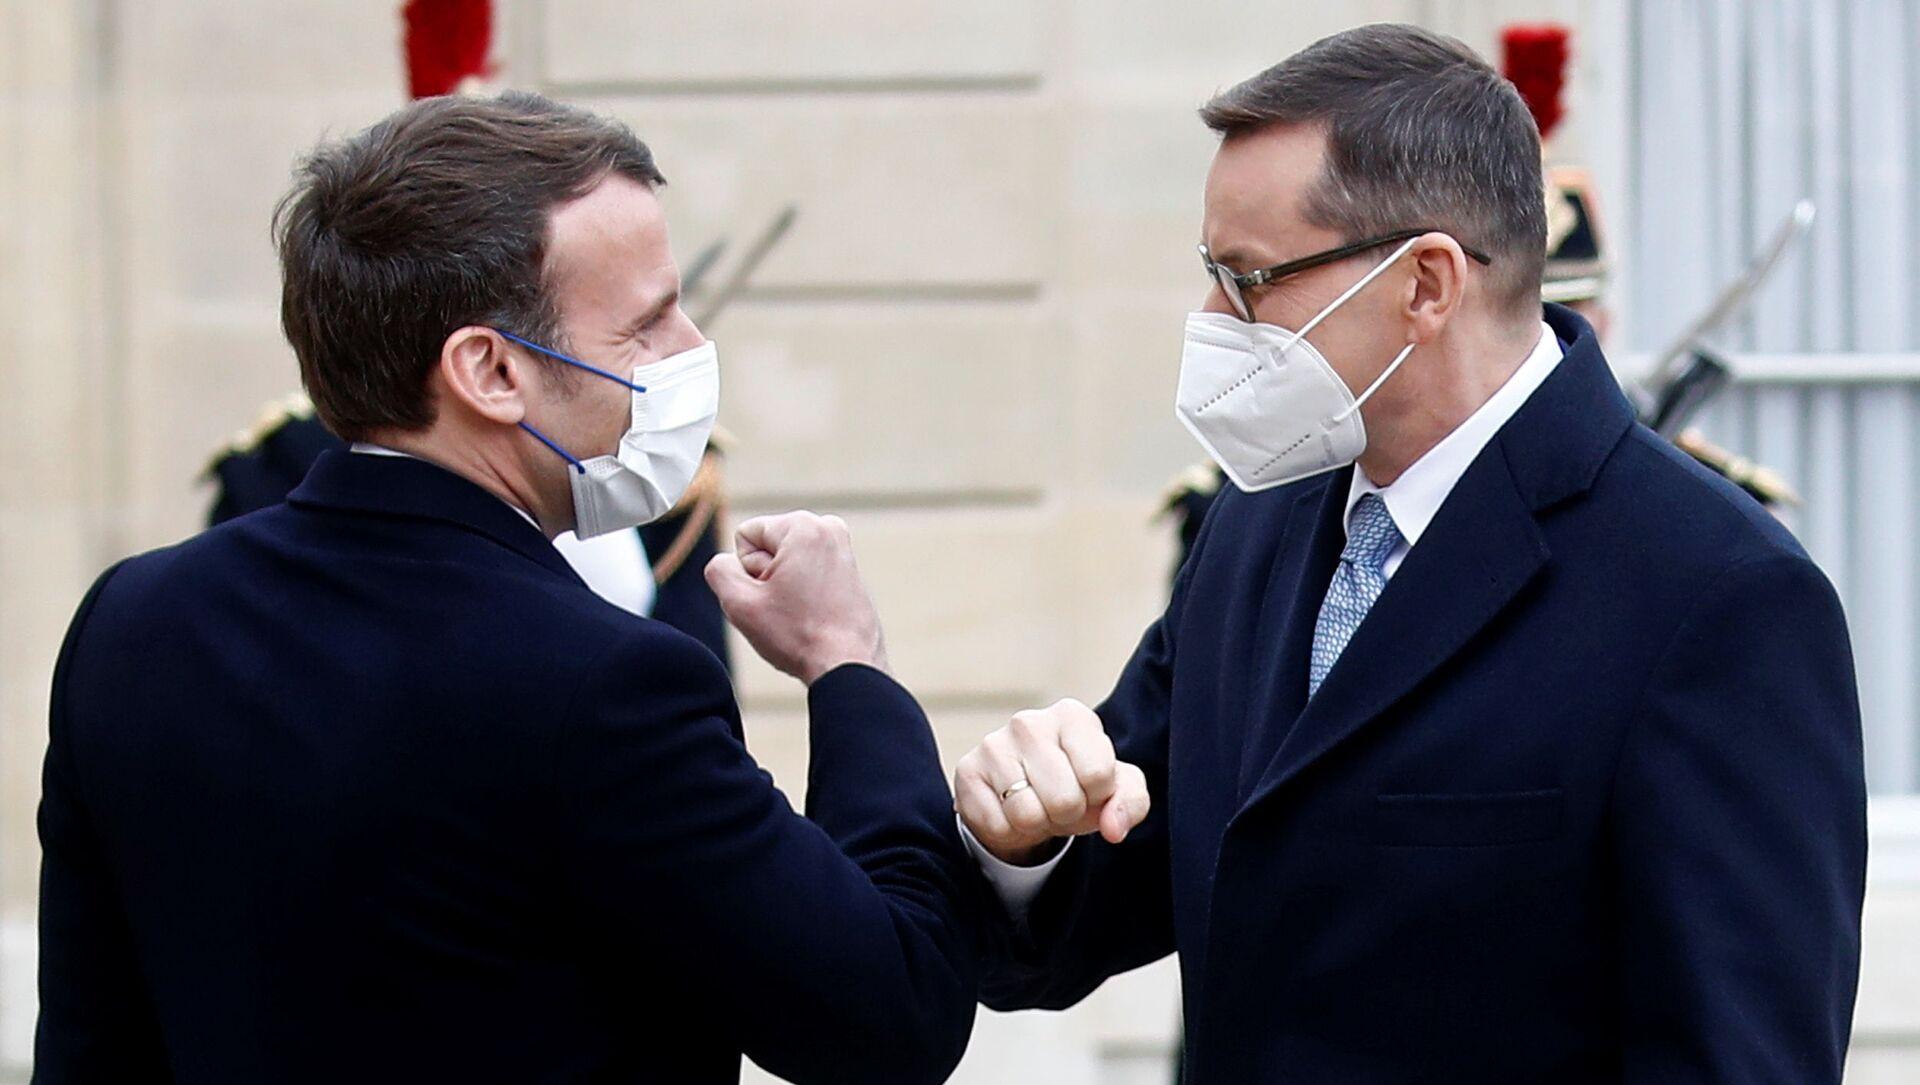 Premier Mateusz Morawiecki i prezydent Francji Emmanuel Macron - Sputnik Polska, 1920, 17.03.2021